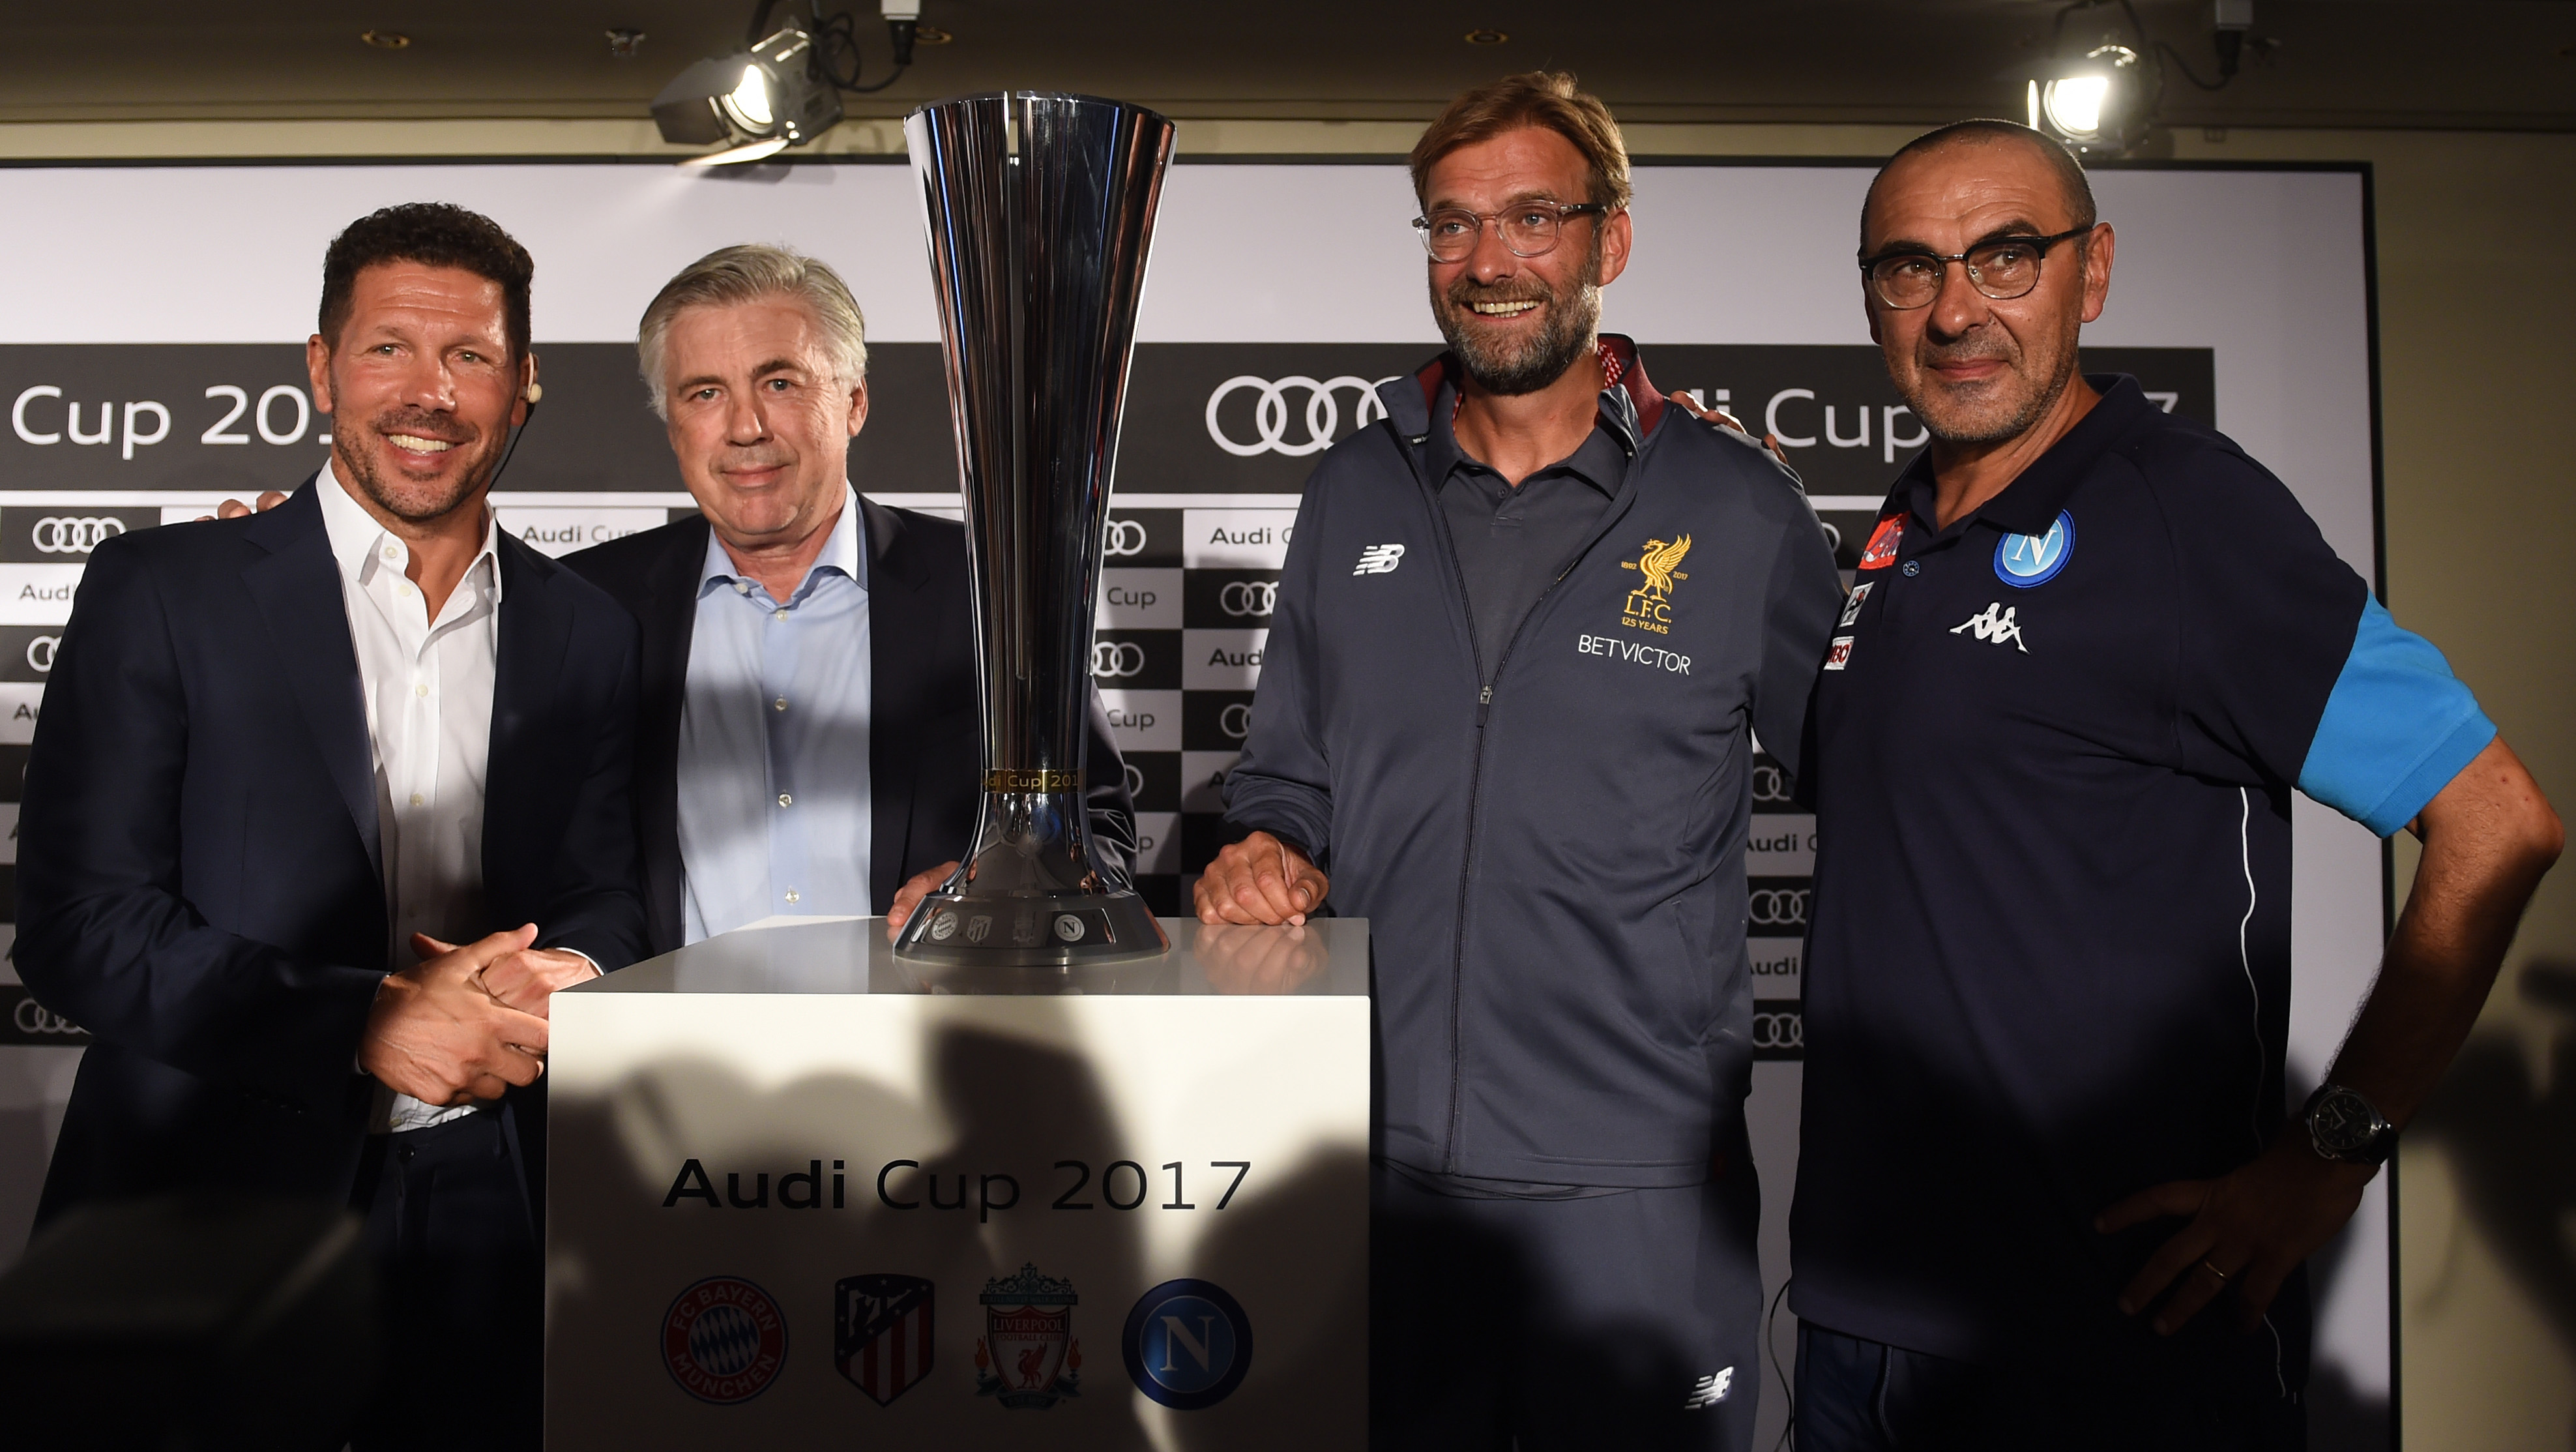 Diego Simone, Carlo ancelotti, Jürgen Klopp, Maurizio Sarri, Audi Cup, 31072017